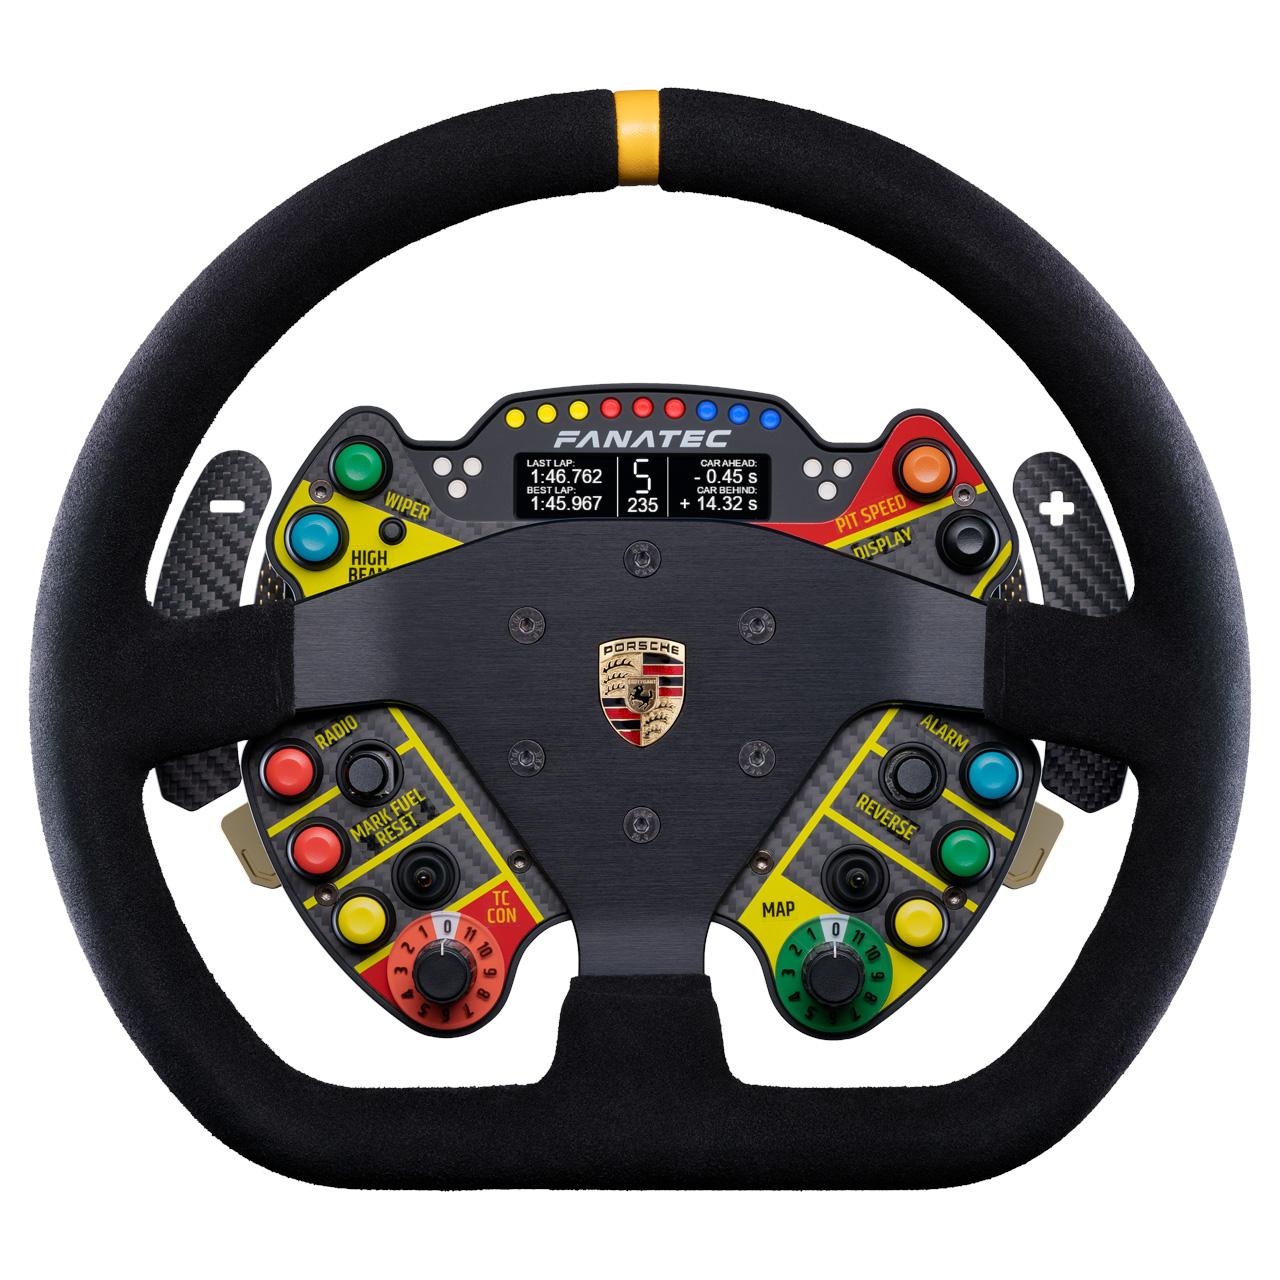 Fanatec PODIUM Steering Wheel SimRacing